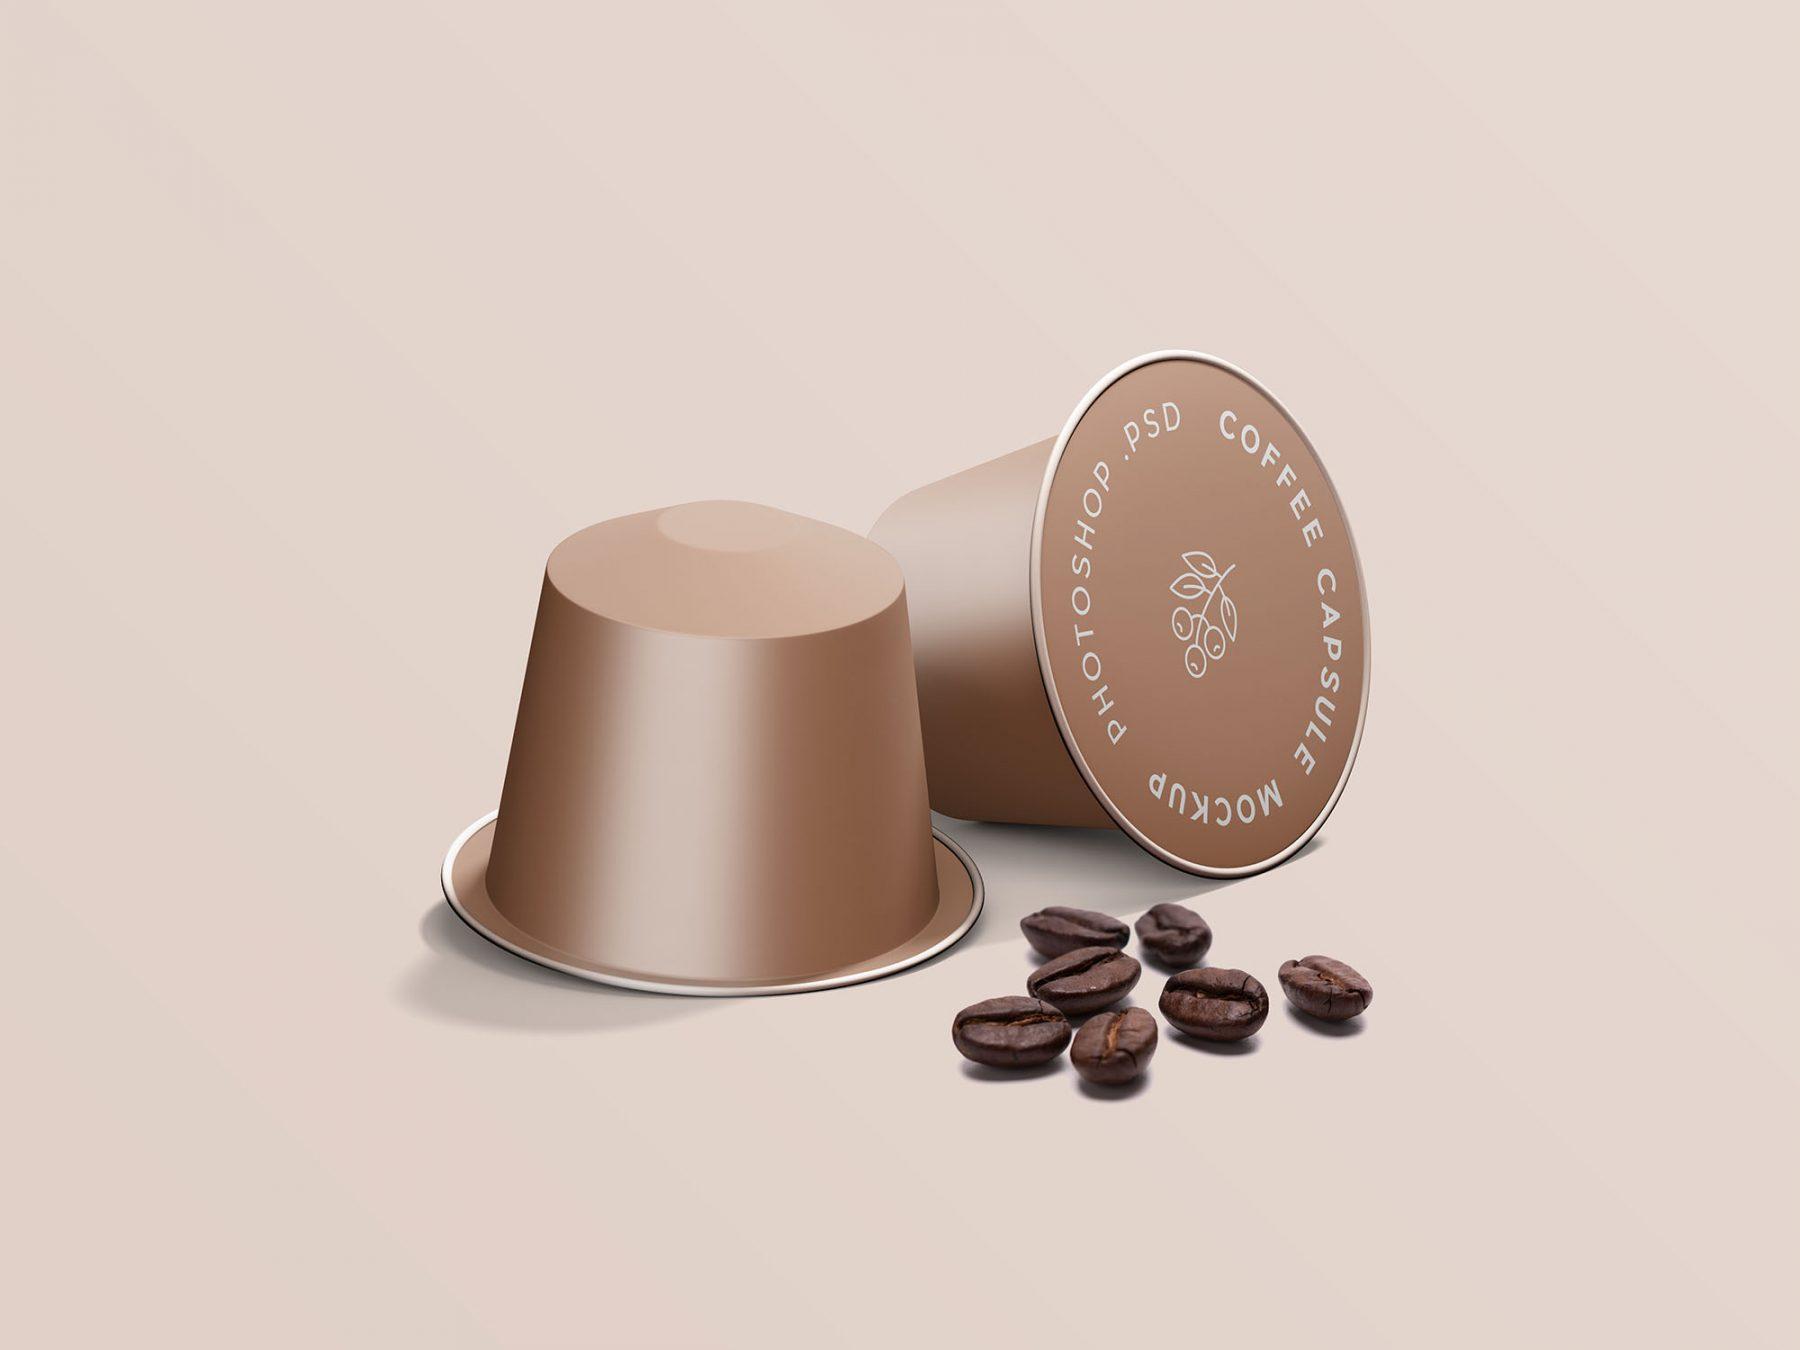 Free Espresso Coffee Capsule Mockup